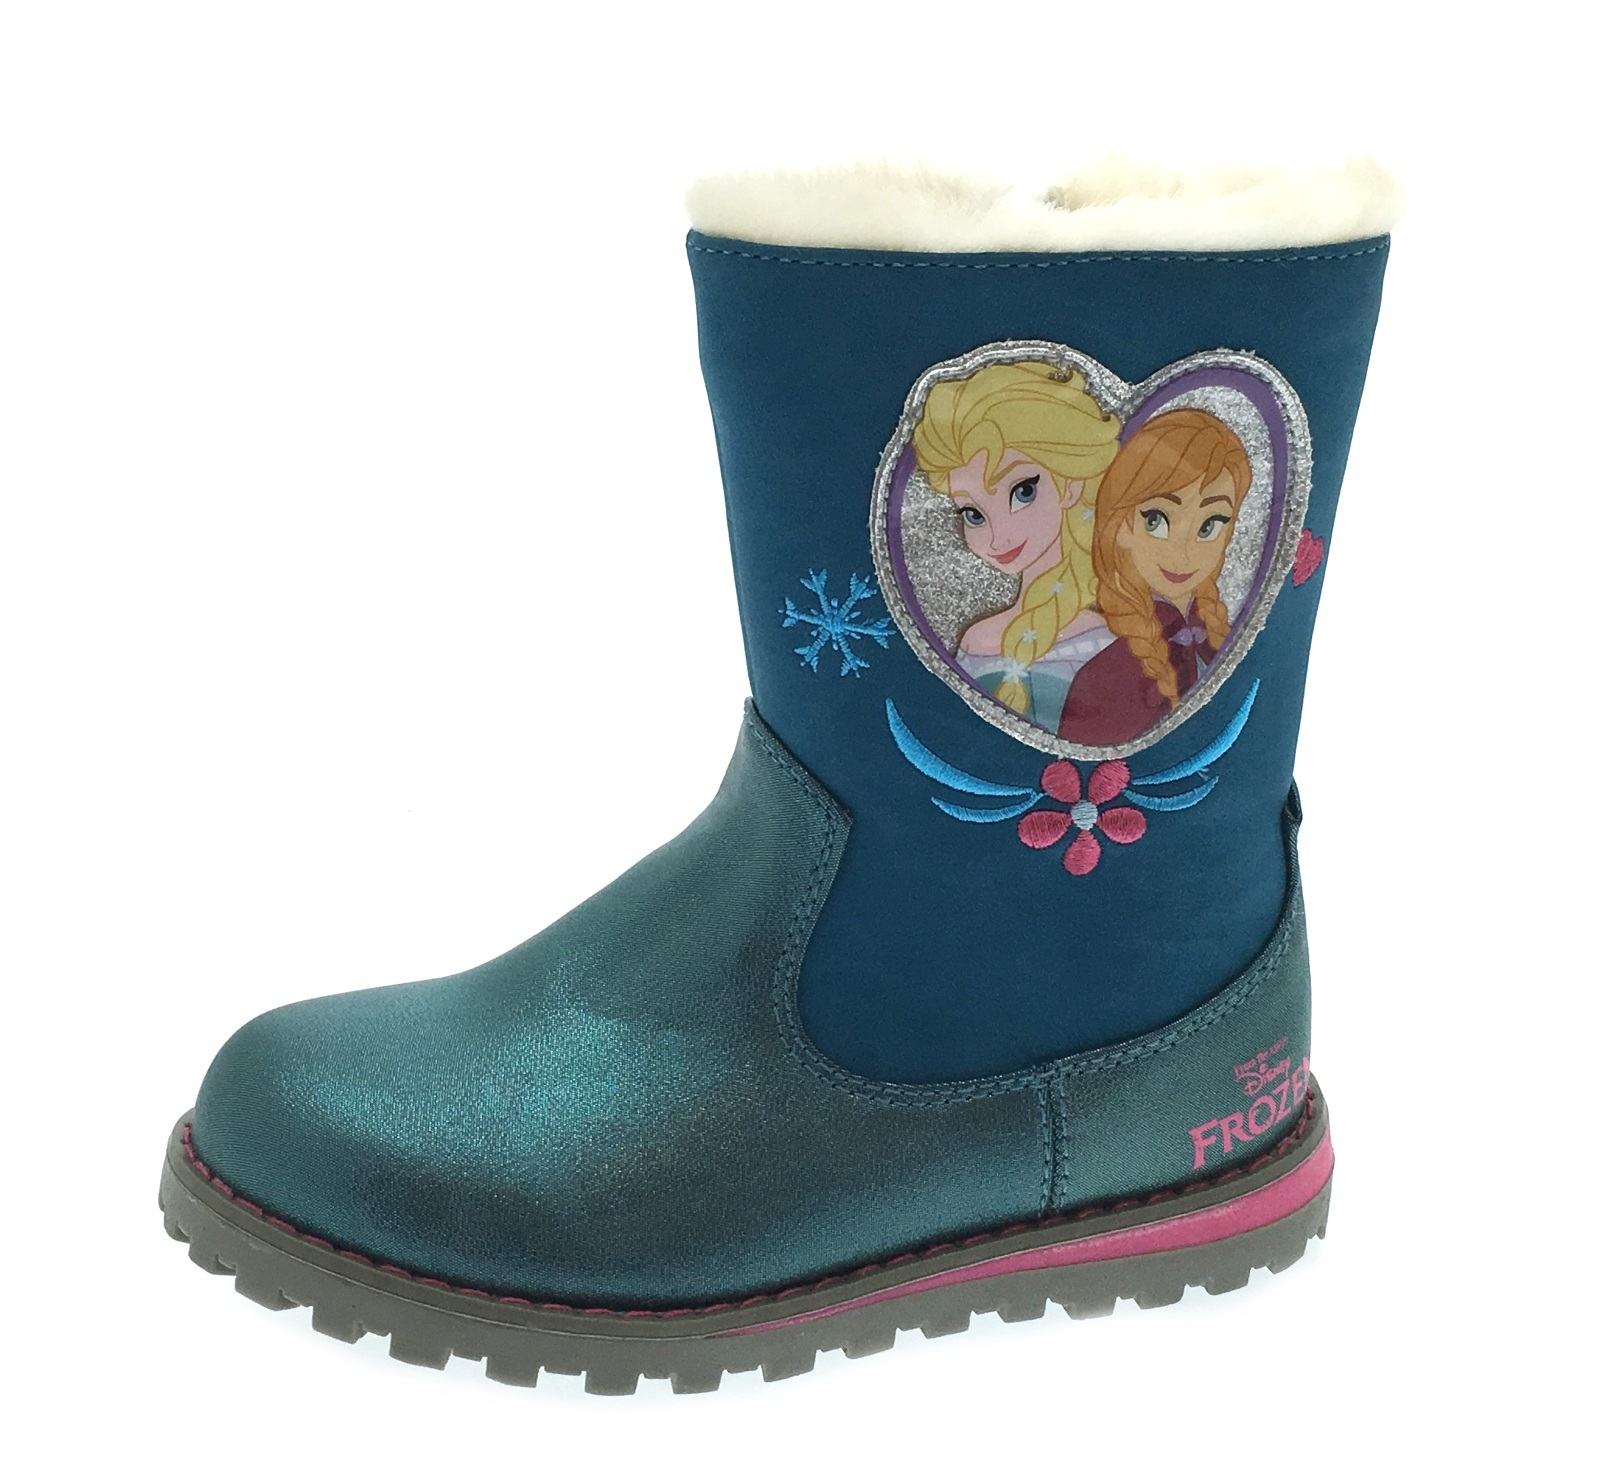 Girls Disney Frozen Warm Winter Boots Faux Fur Trim Snow